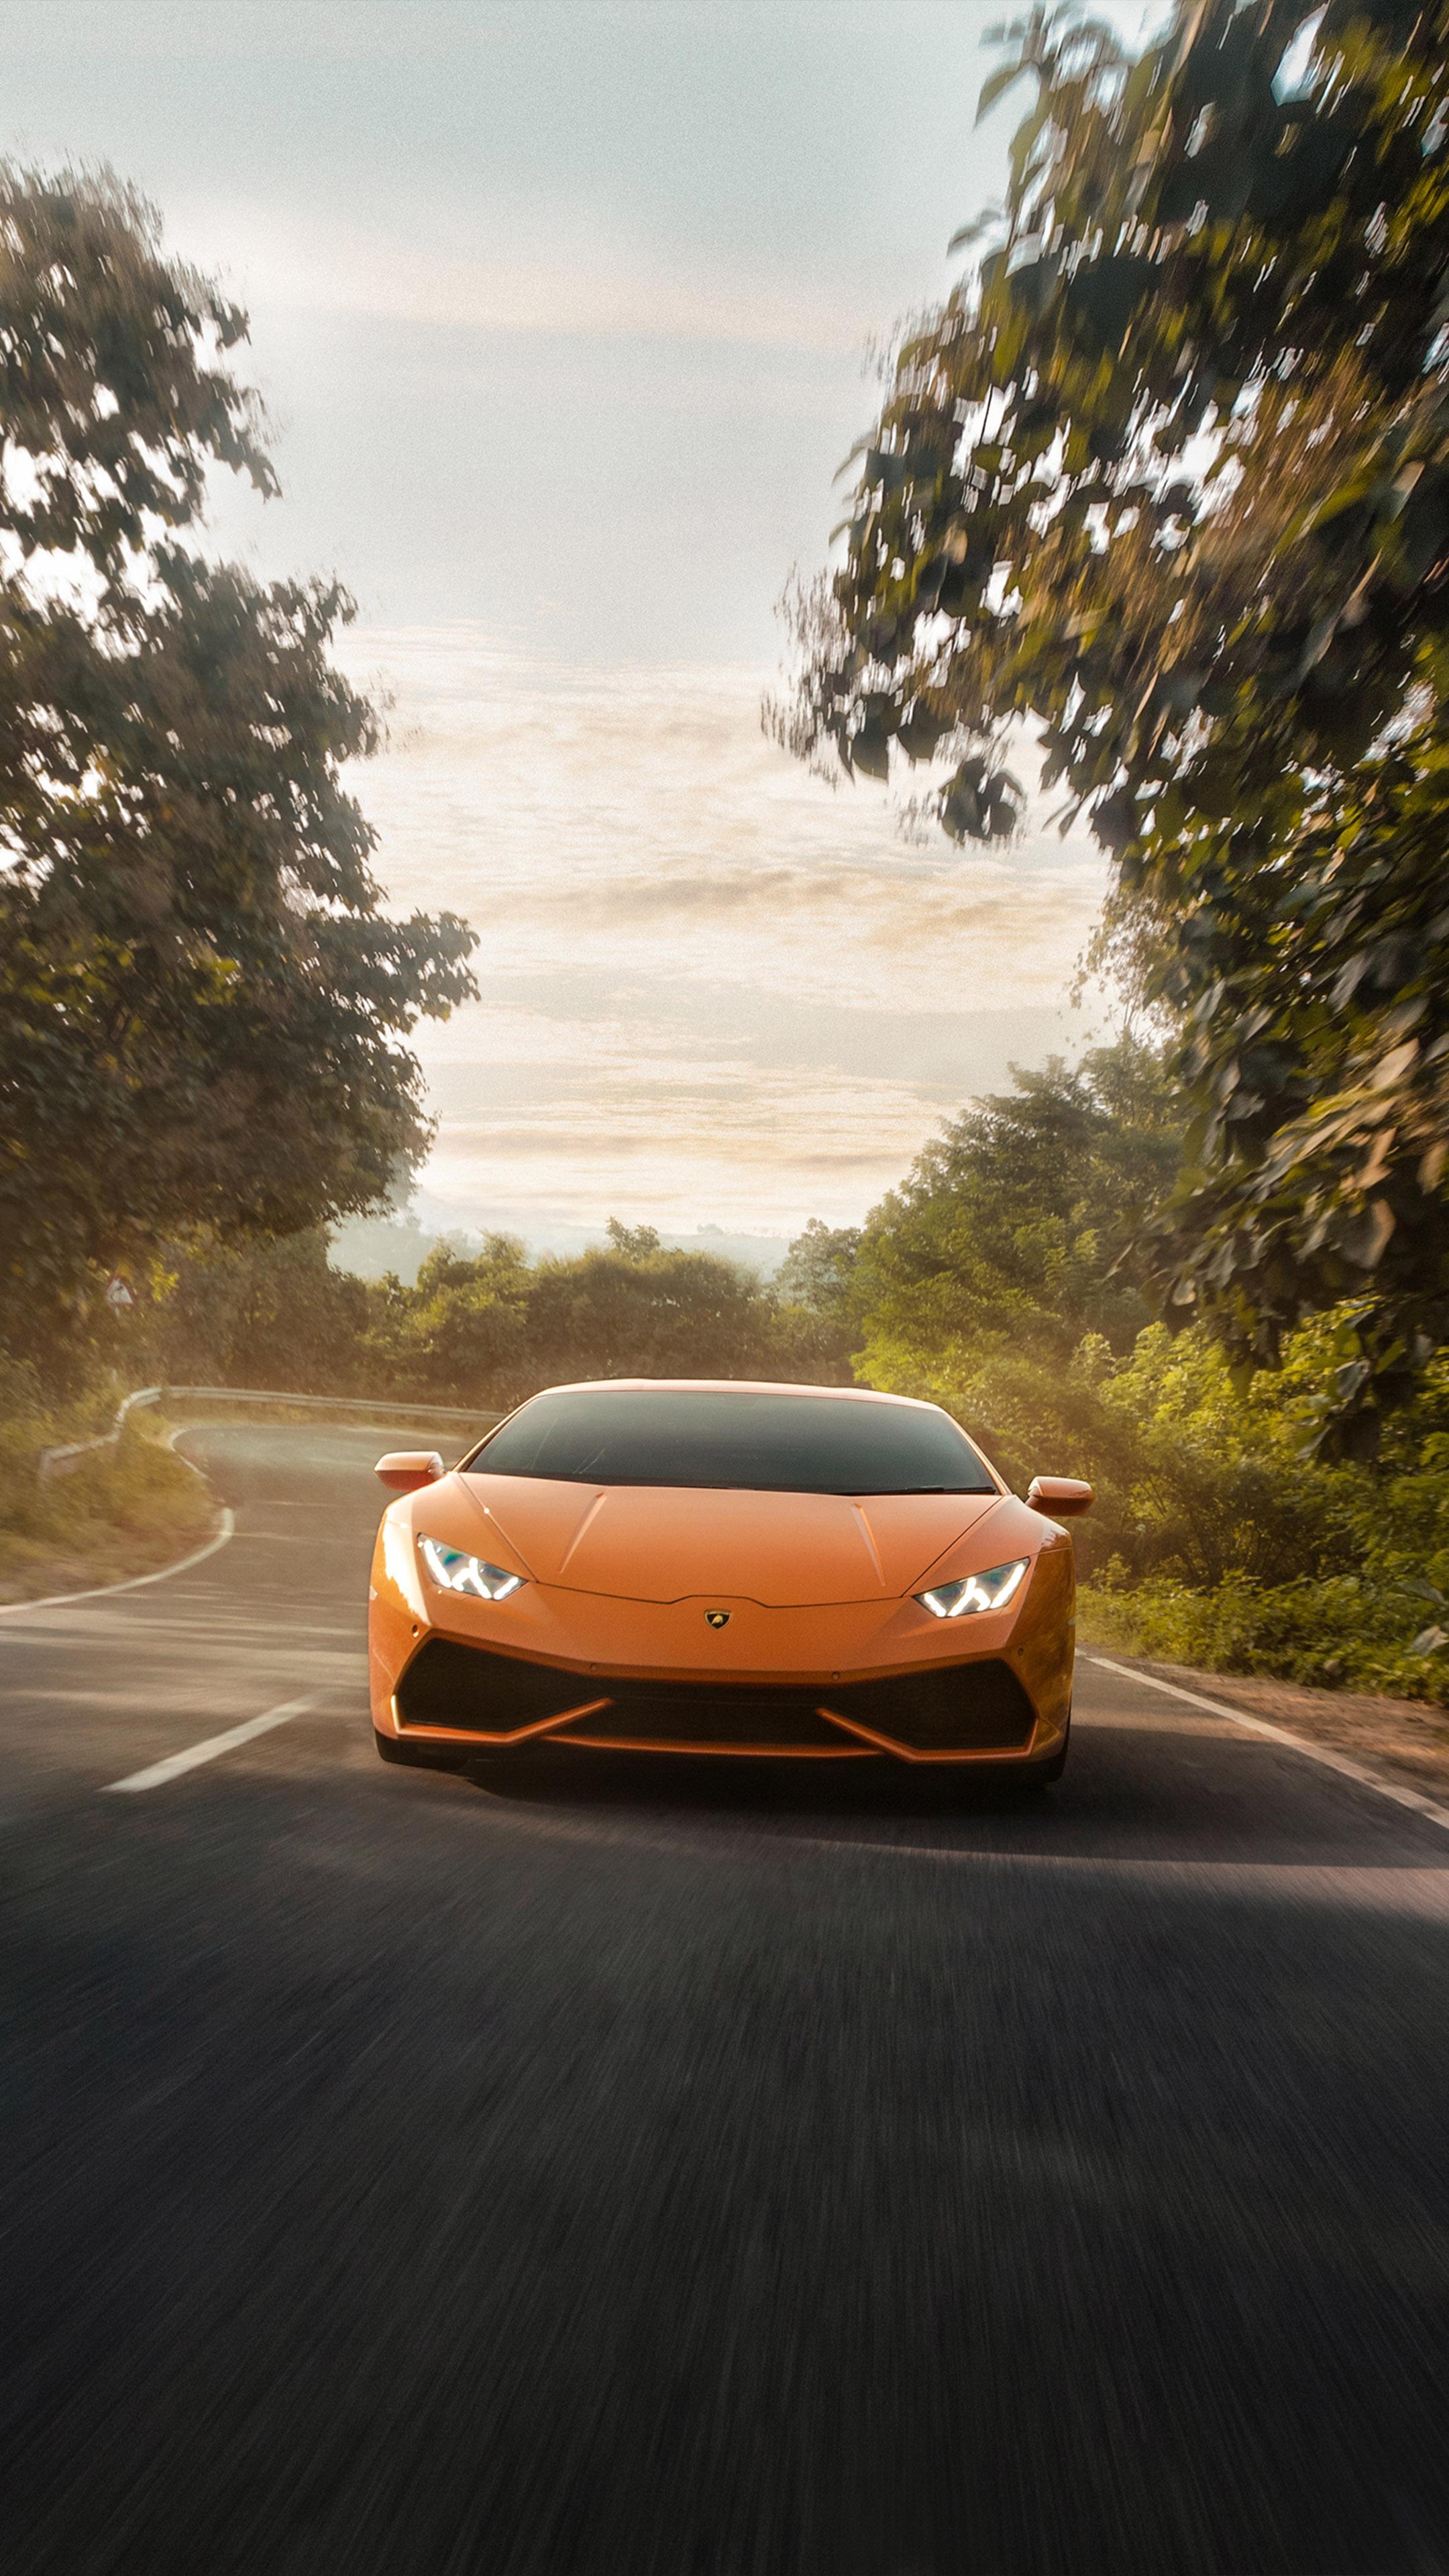 Download Lamborghini Huracan On Road Free Pure 4k Ultra Hd Mobile